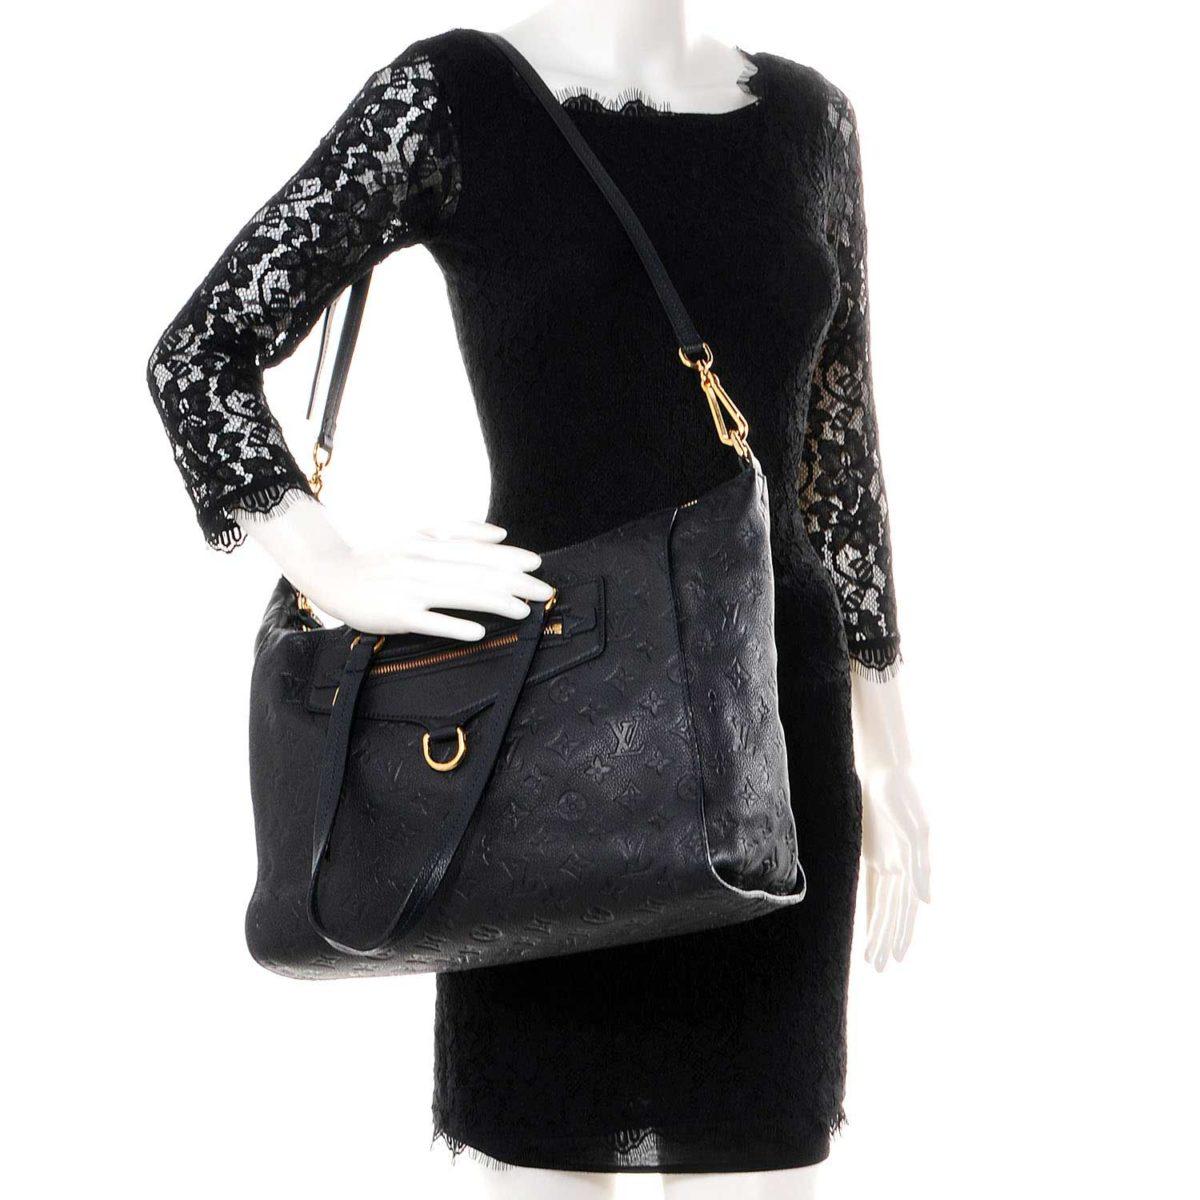 Louis Vuitton Monogram Empreinte Lumineuse Pm Black Noir Luxity